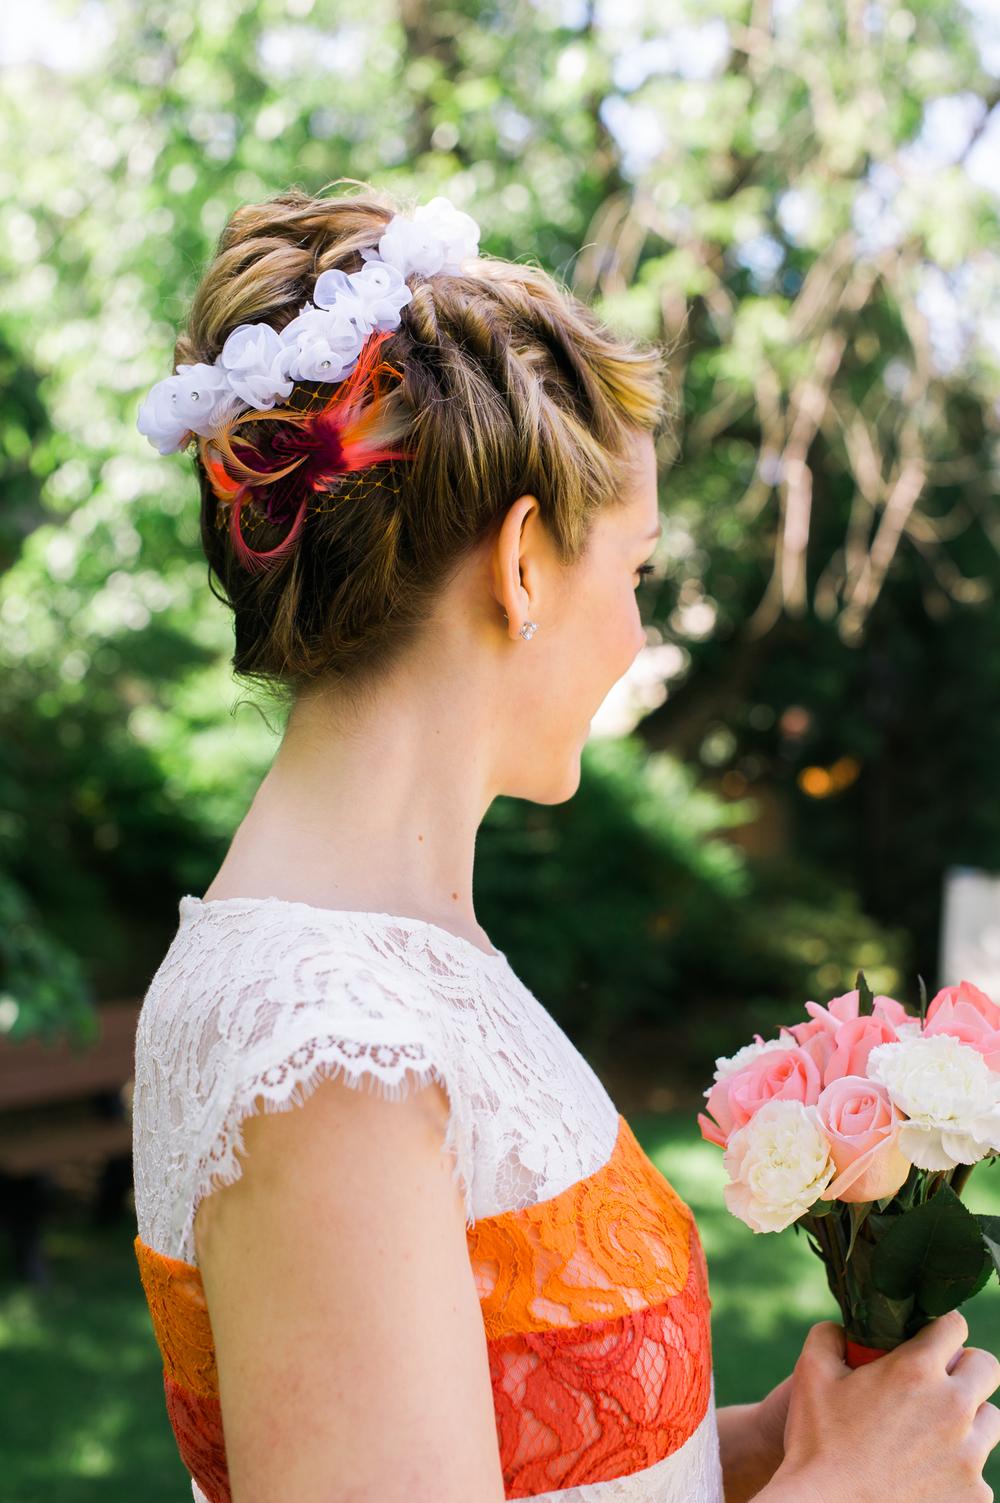 MarkHeather-Occoquan-Virginia-Wedding-7.jpg